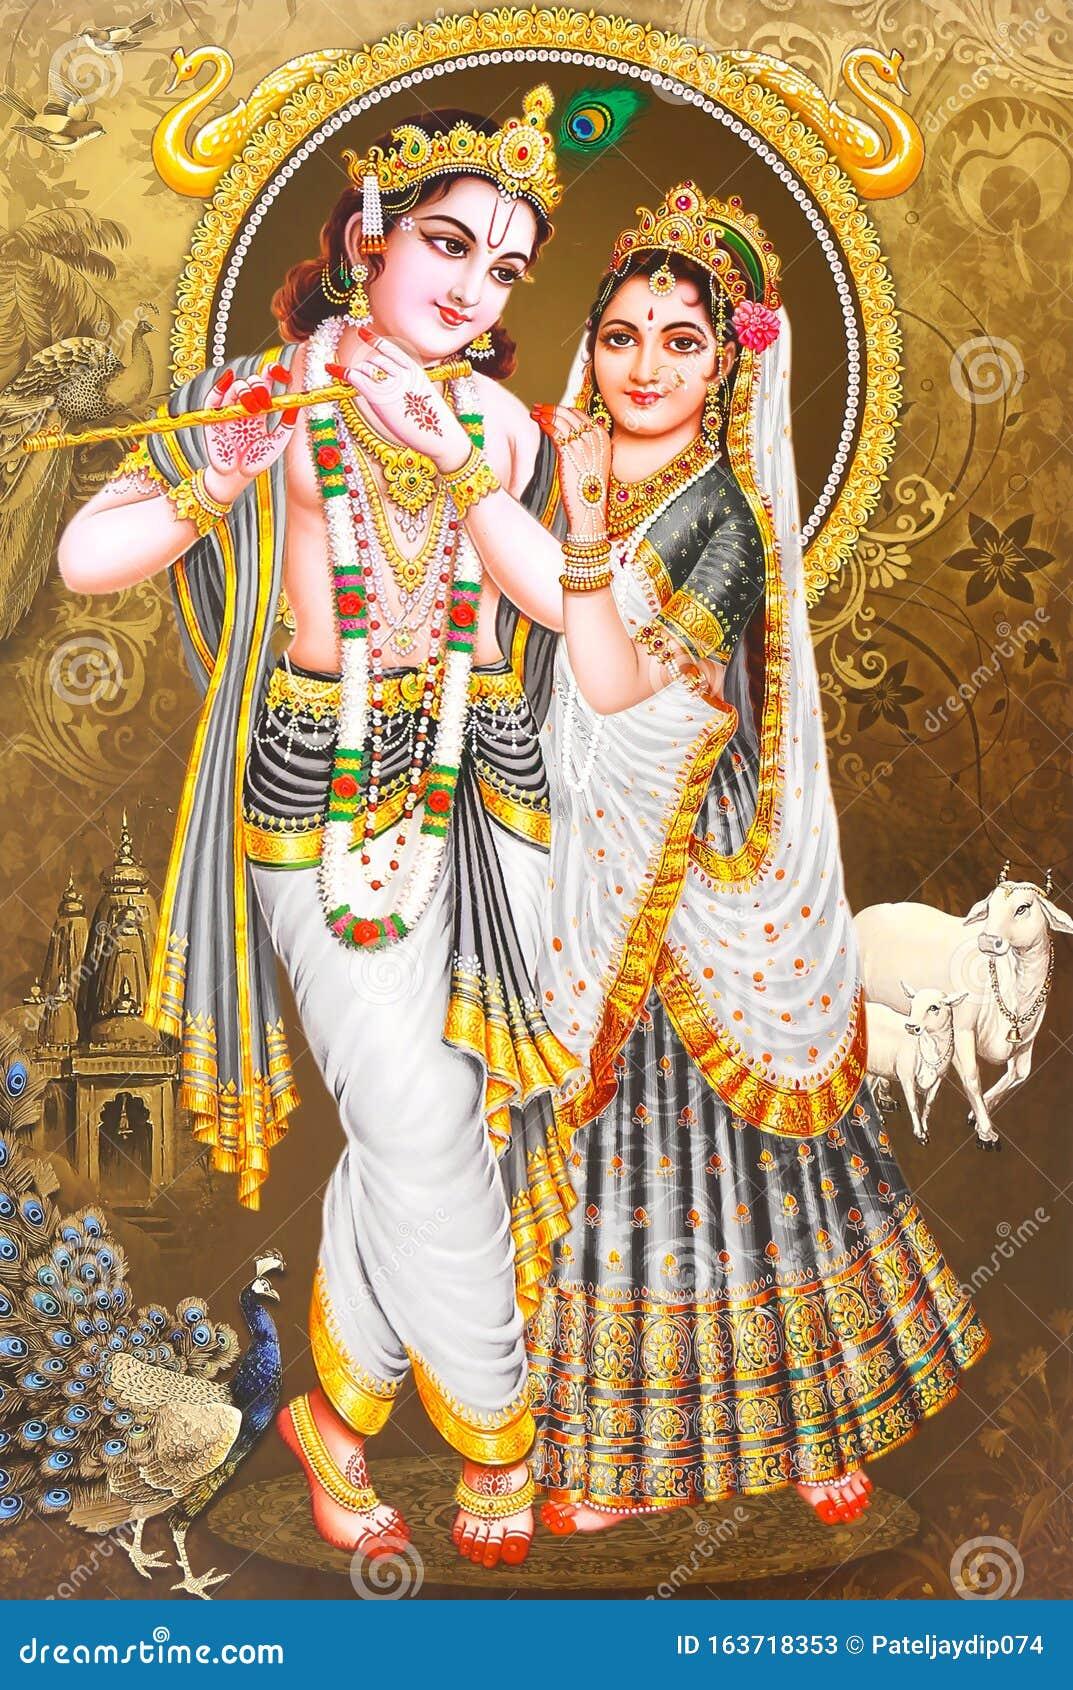 1 806 radha krishna photos free royalty free stock photos from dreamstime https www dreamstime com lord radha krishna beautiful wallpaper hindu god colorful background image163718353